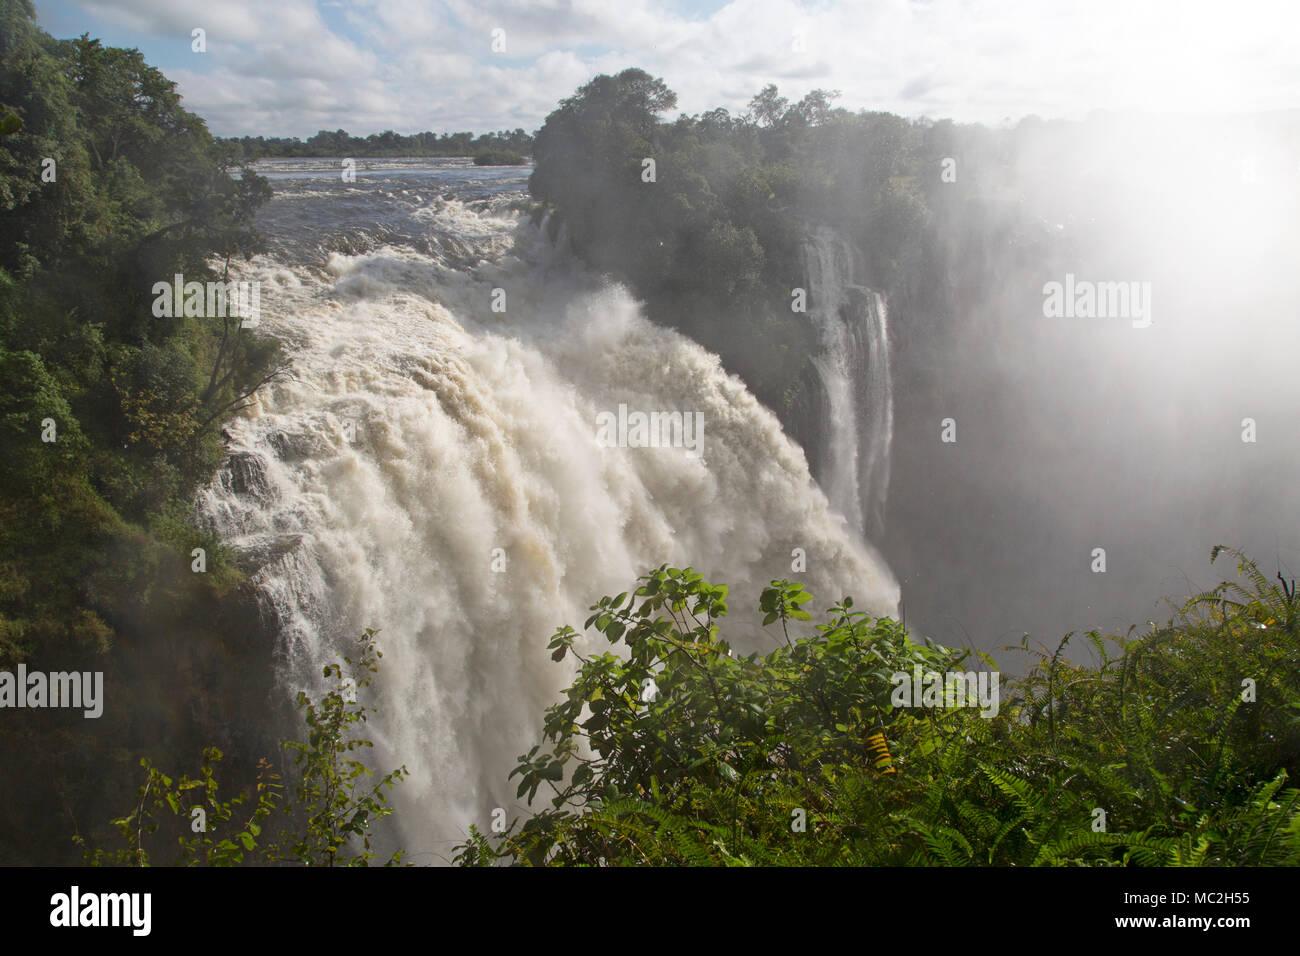 Le Devil's Cataract à Victoria Falls (Mosi-oa-Tunya) à la frontière du Zimbabwe et de la Zambie. Photo Stock